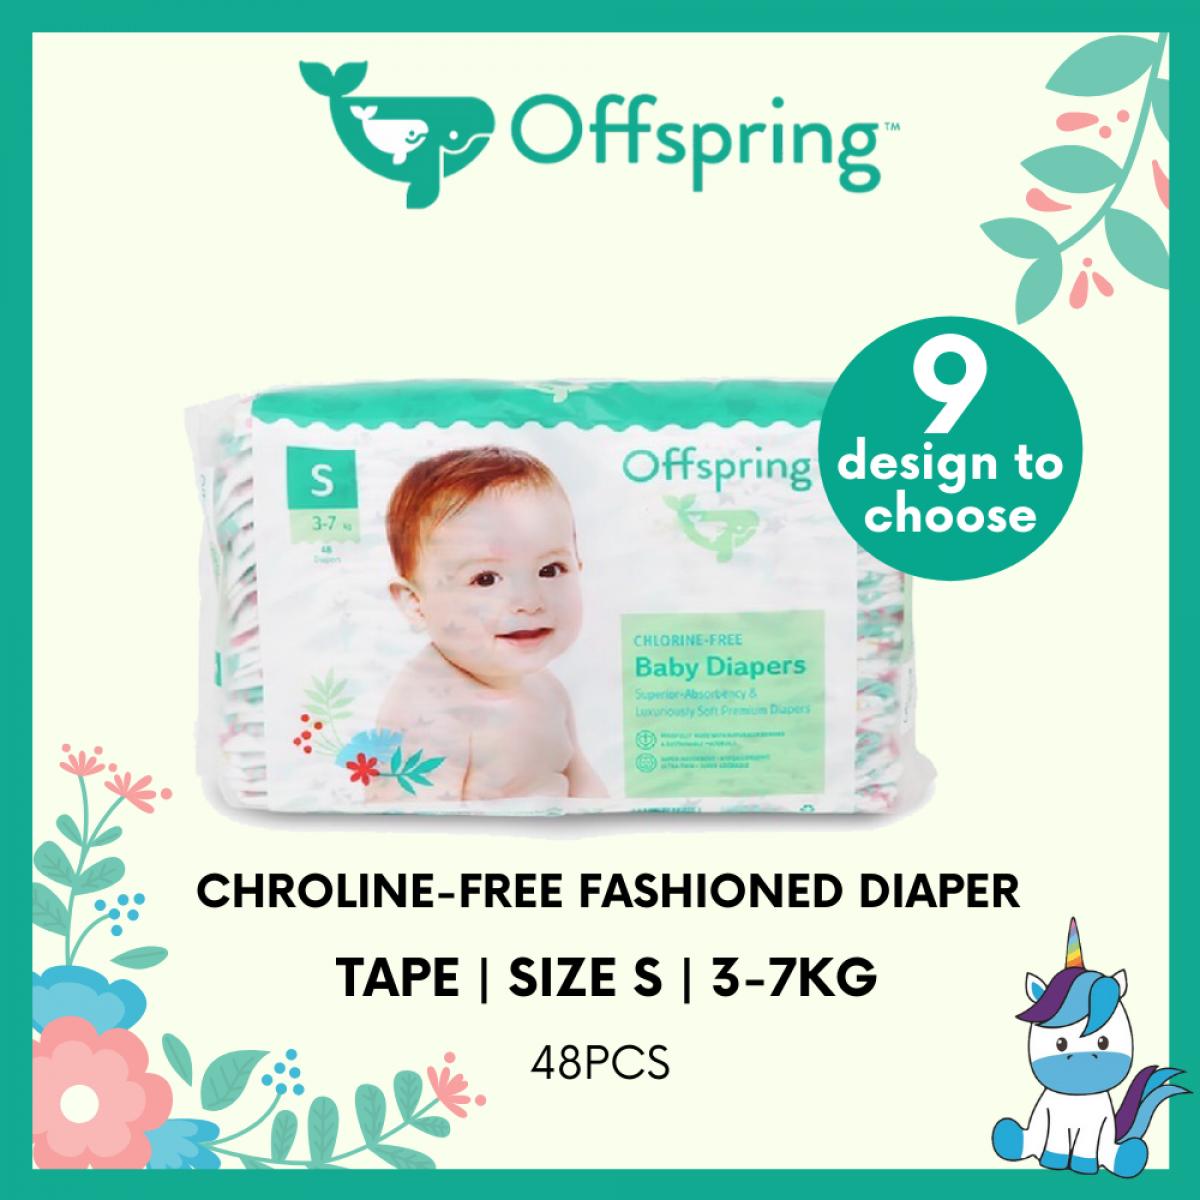 Offspring Chroline-Free Fashioned Tape Diaper S 48pcs - 9 Designs